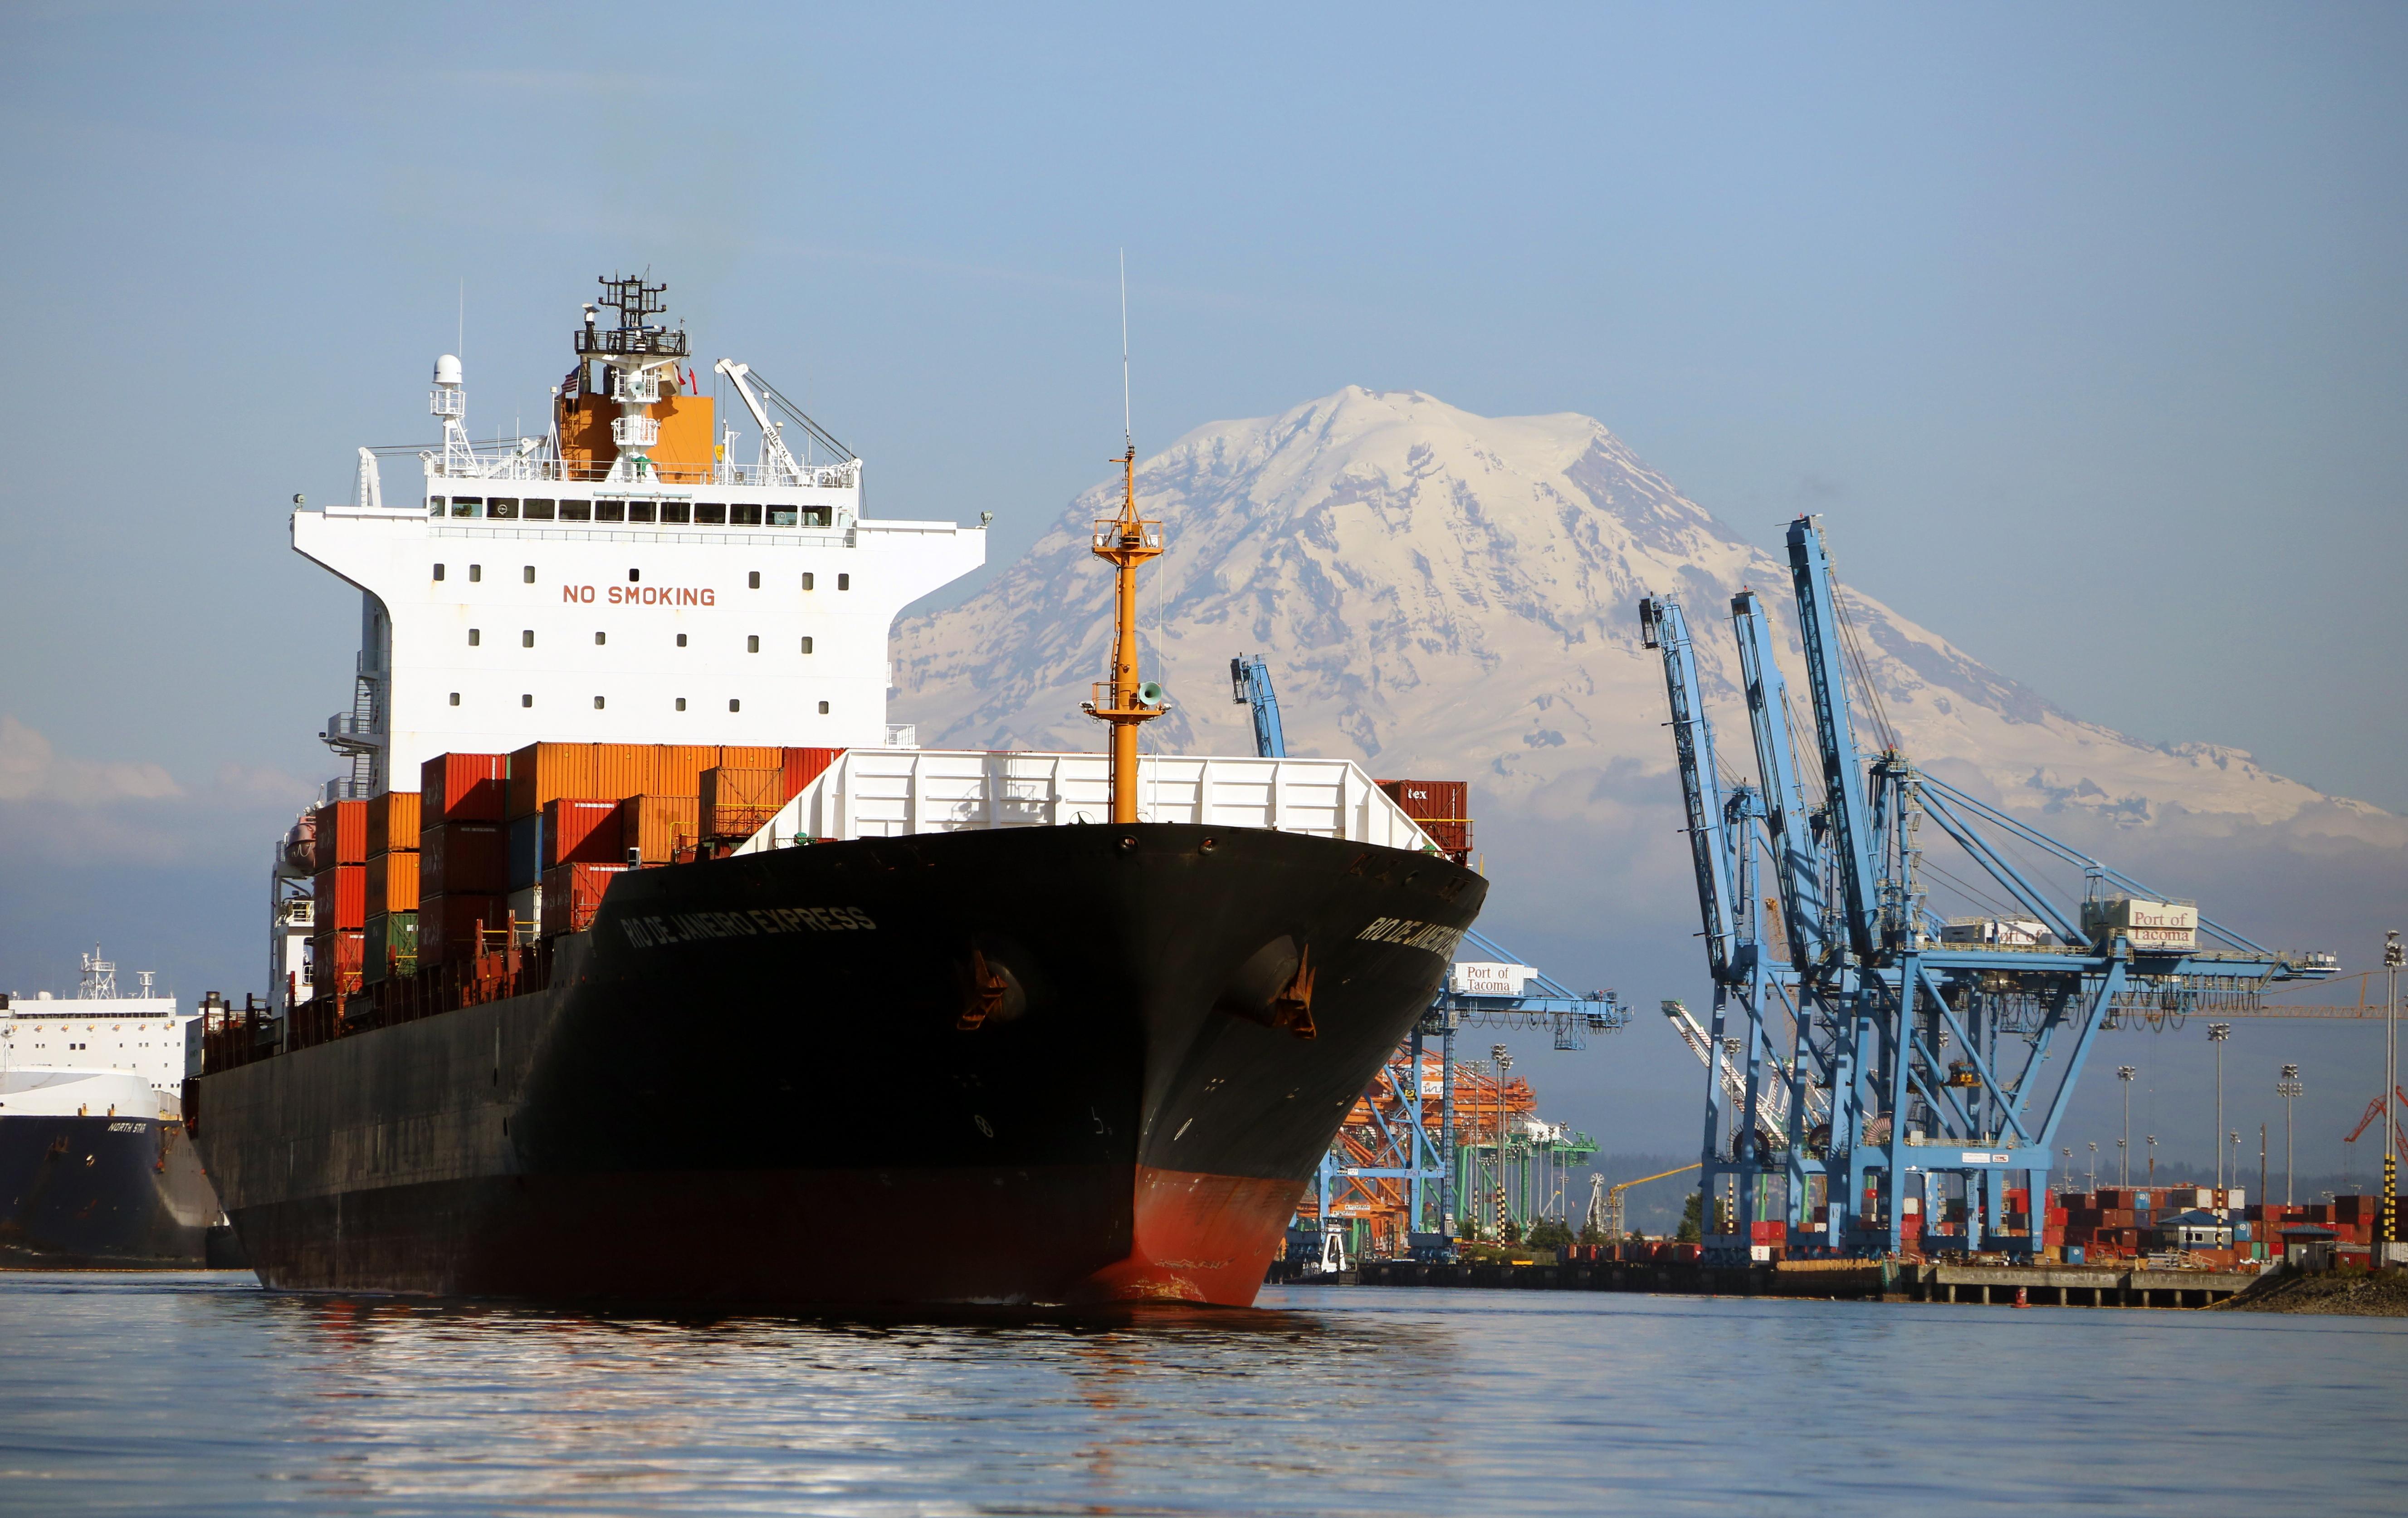 Tacoma Port + Rainier